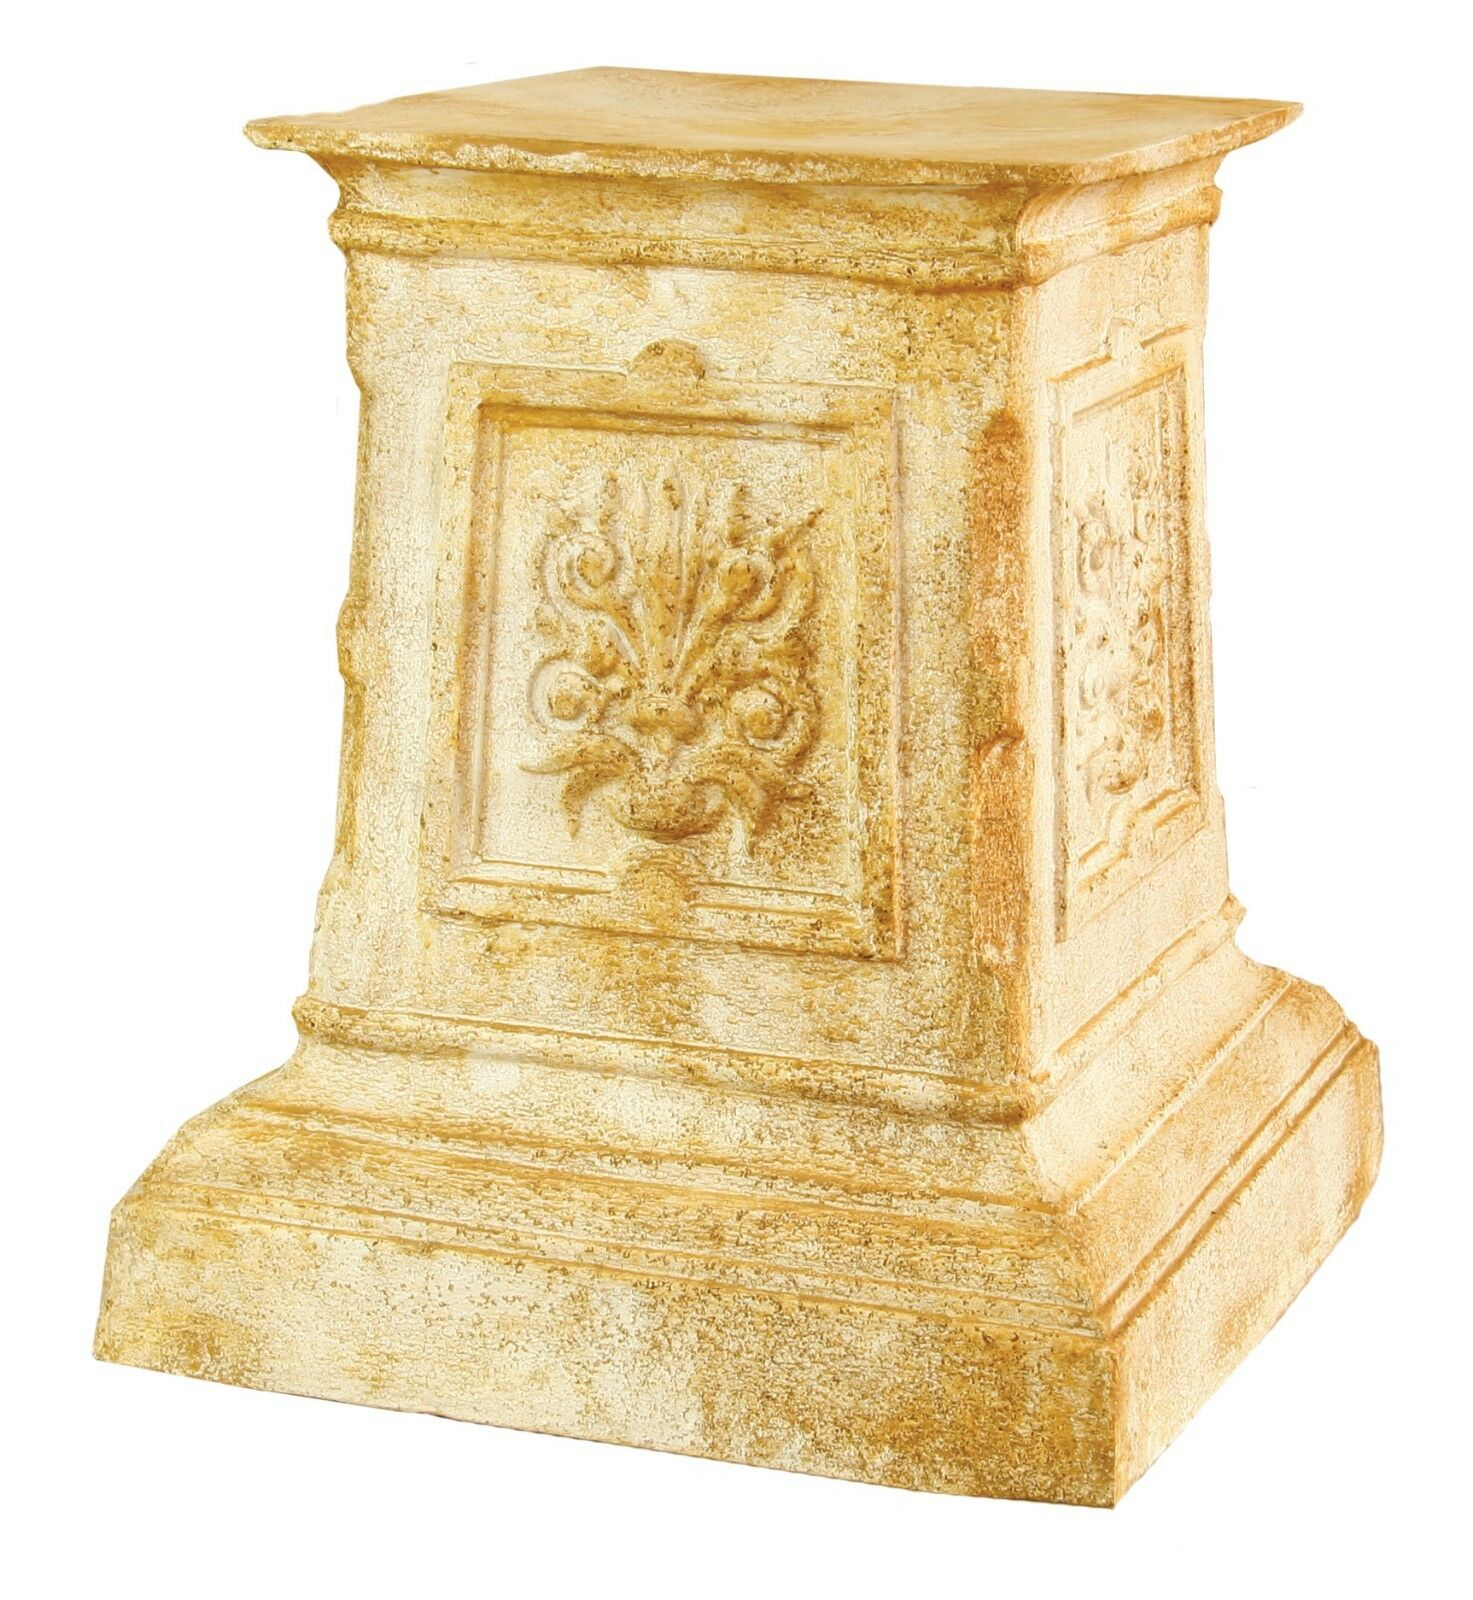 English Garden Pedestal For Urn Statue Sculpture- Fiberstone by Orlandi Orlandi Orlandi FS8218 0901e4